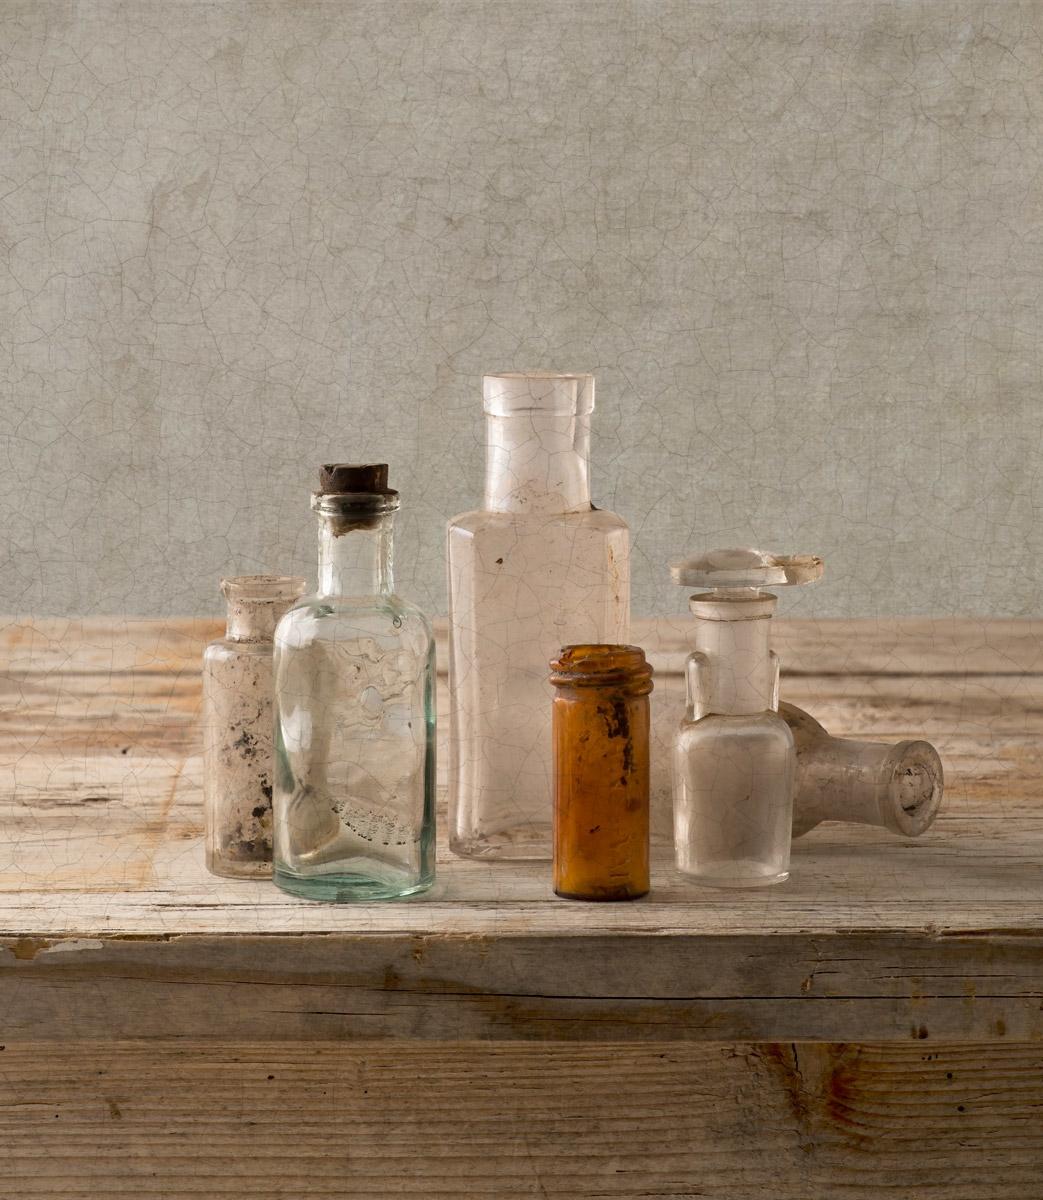 Grains de Vals - vintage, bottles - tinekestoffels | ello